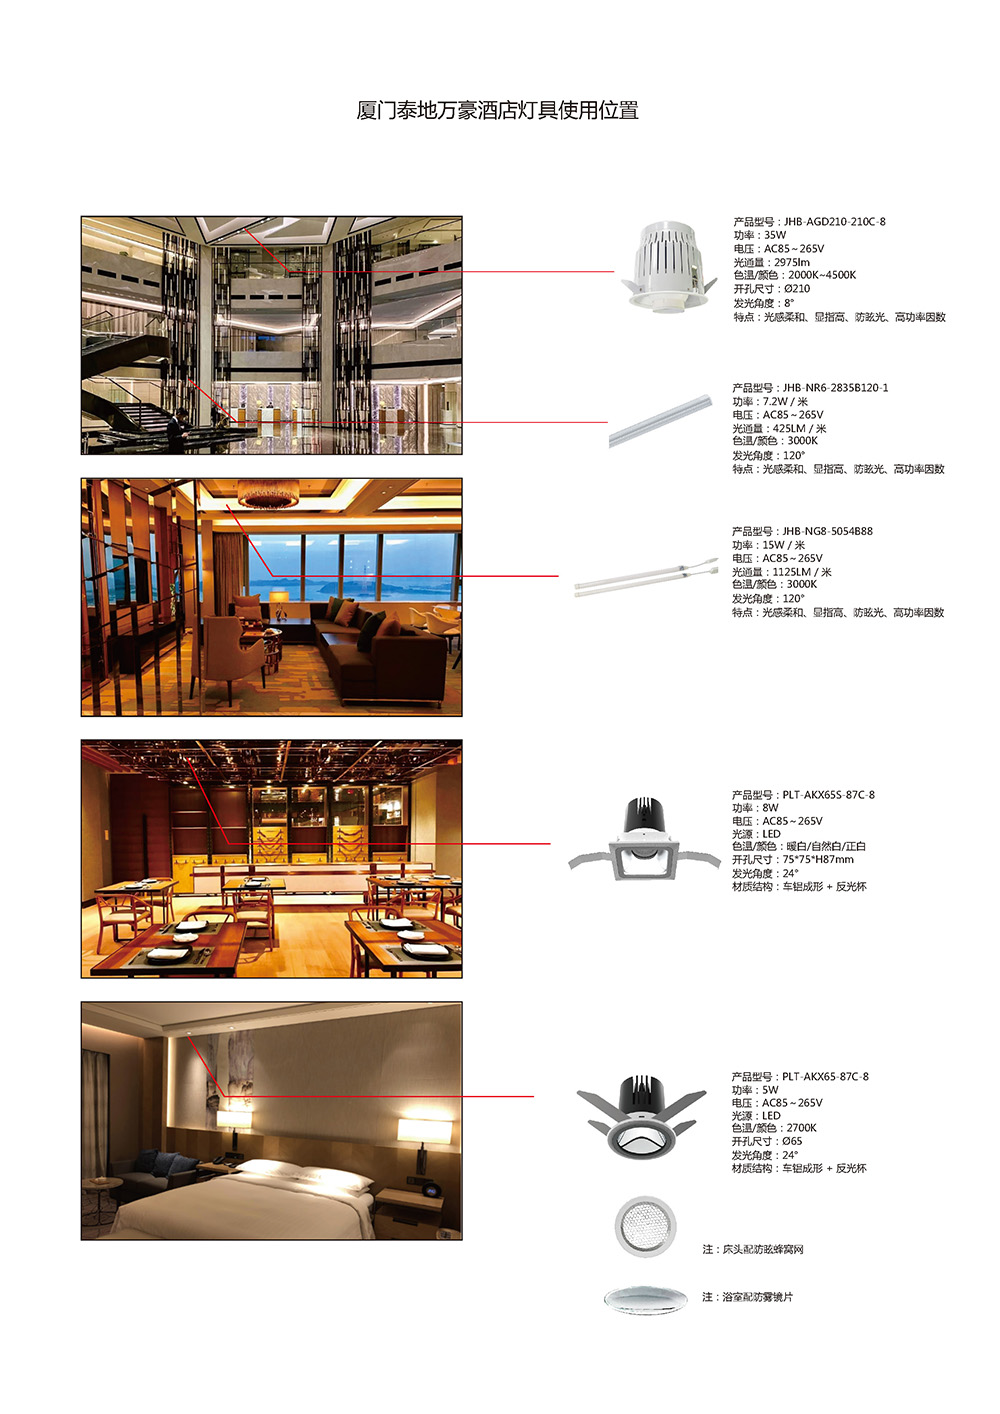 JPEG-7厦门泰地万豪酒店